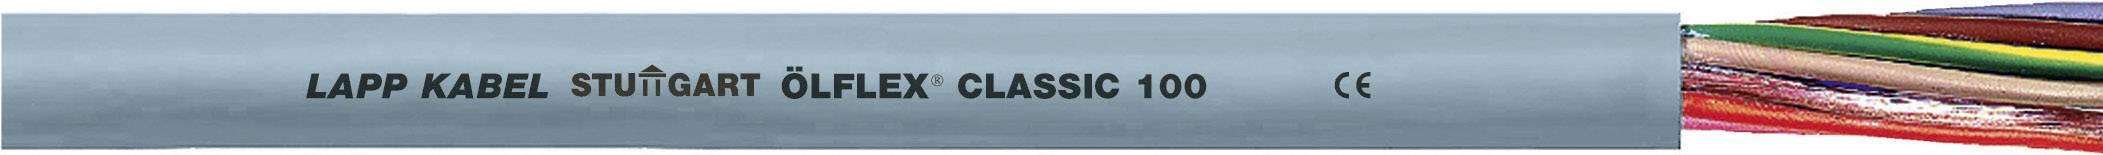 Kabel LappKabel Ölflex CLASSIC 100 3G0,75 (00100224), PVC, 5,7 mm, 750 V, šedá, 1000 m